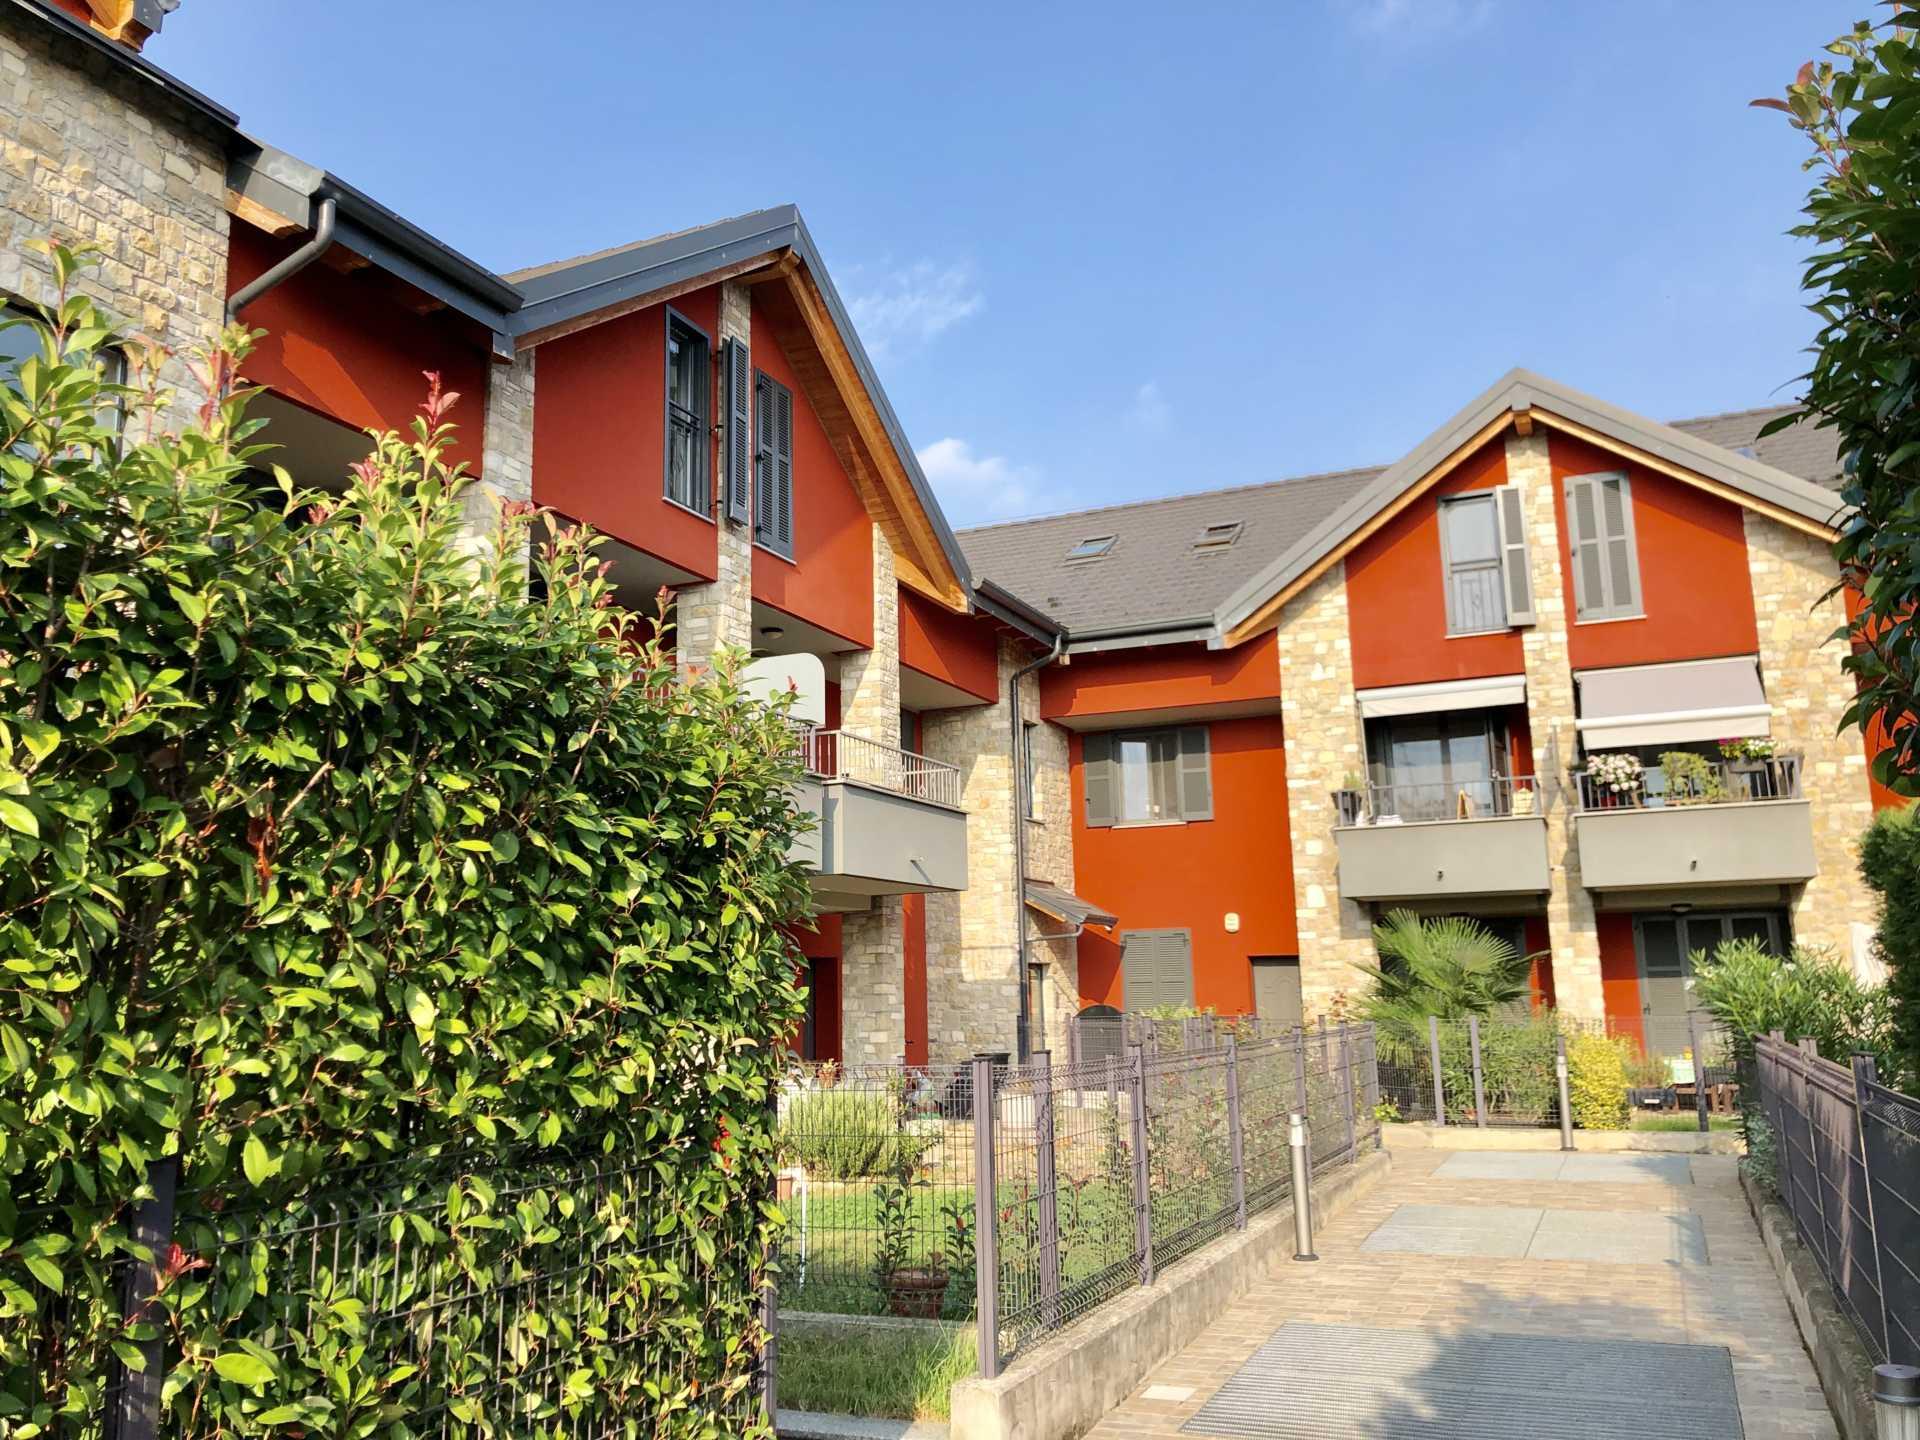 Appartamento-in-vendita-a-Cavenago